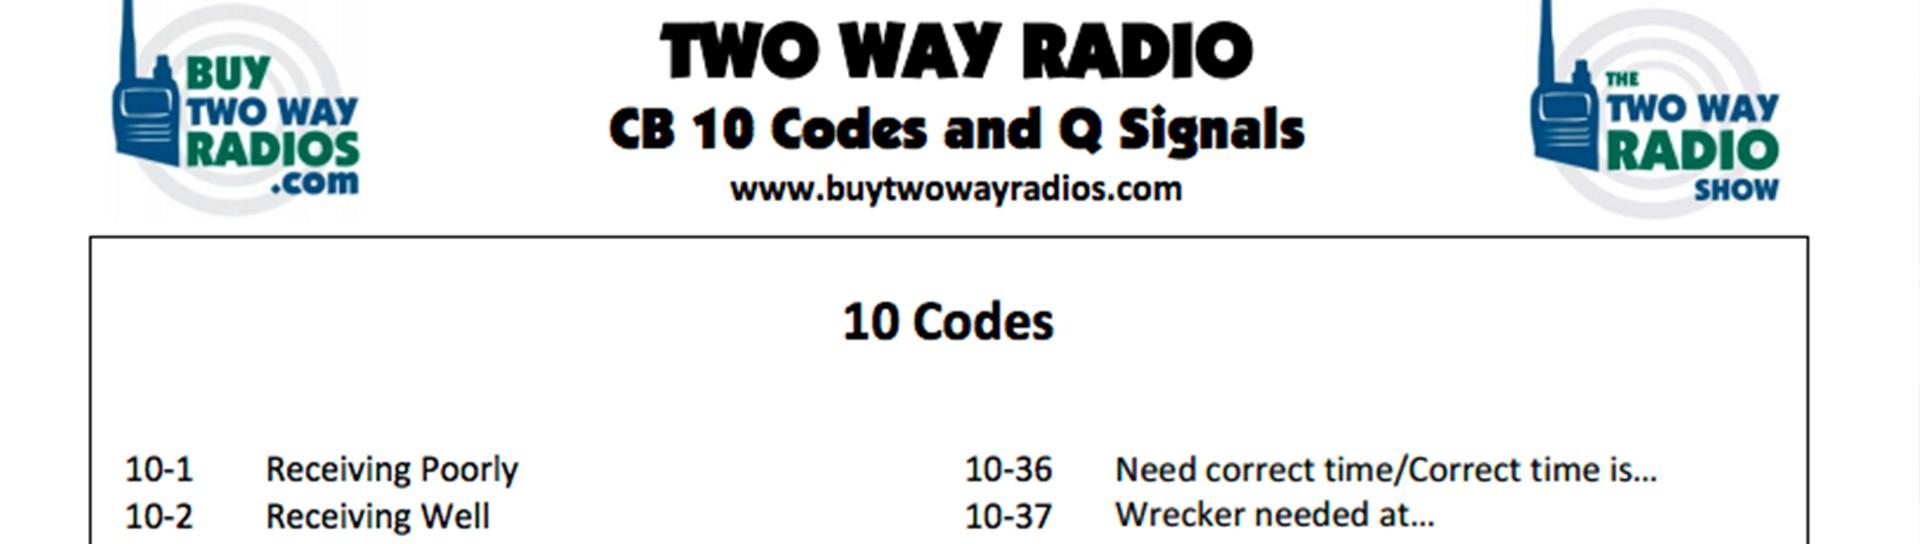 CB Radio Codes